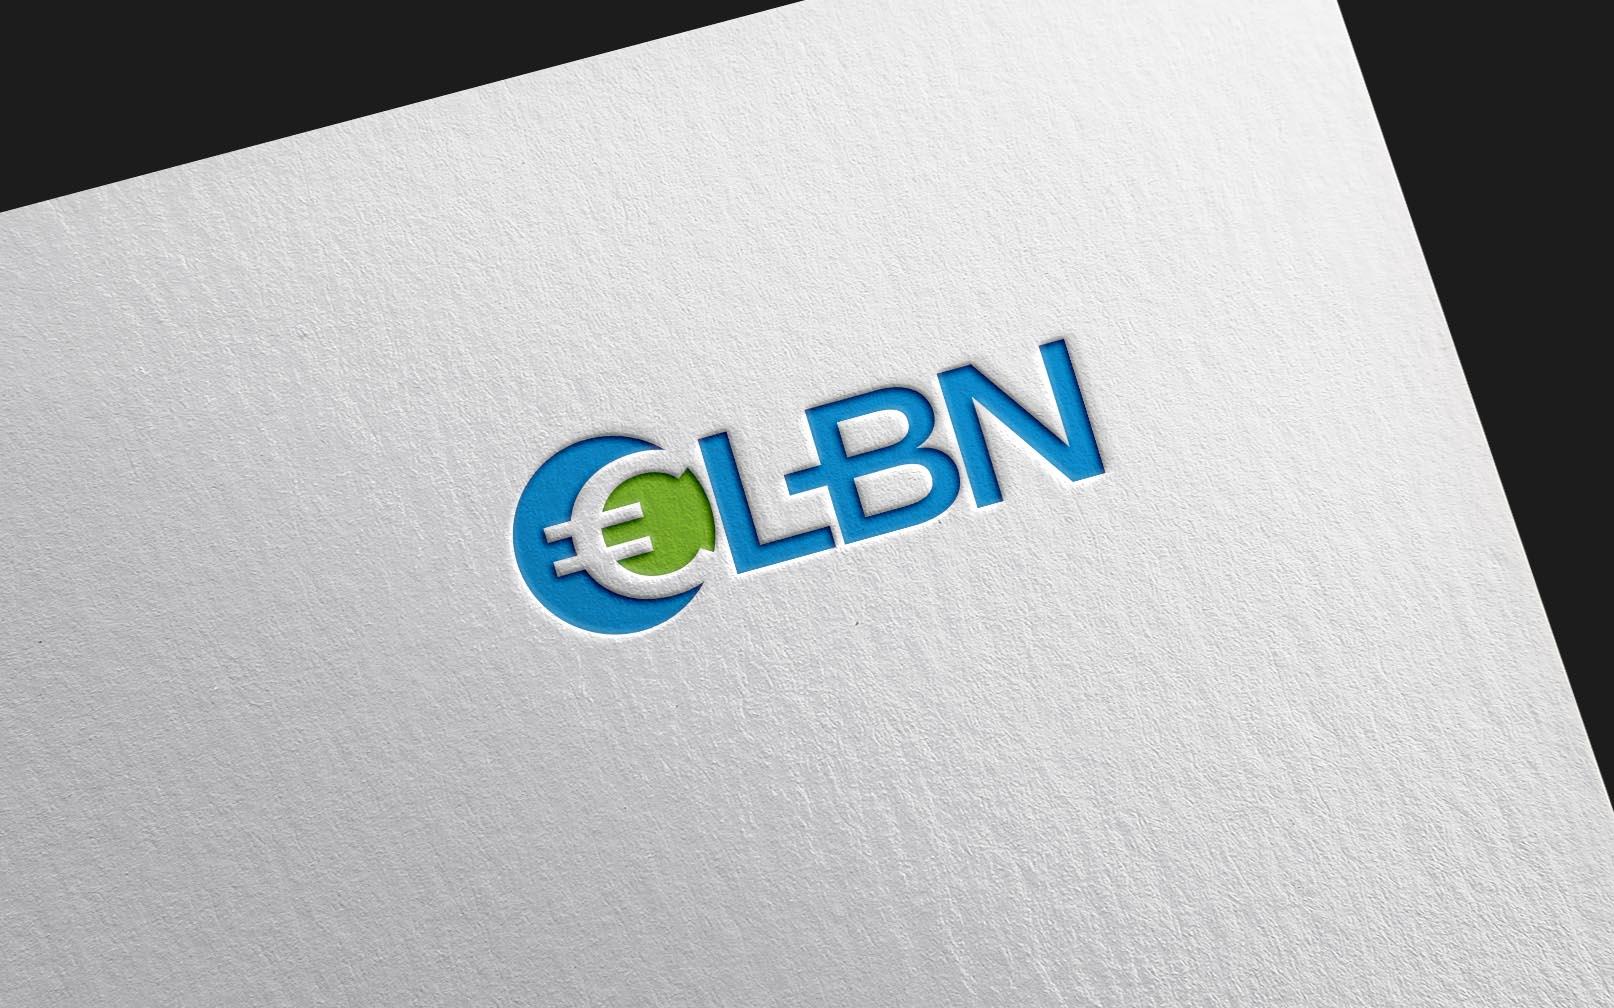 CLBN 公司Logo设计_3025280_k68威客网